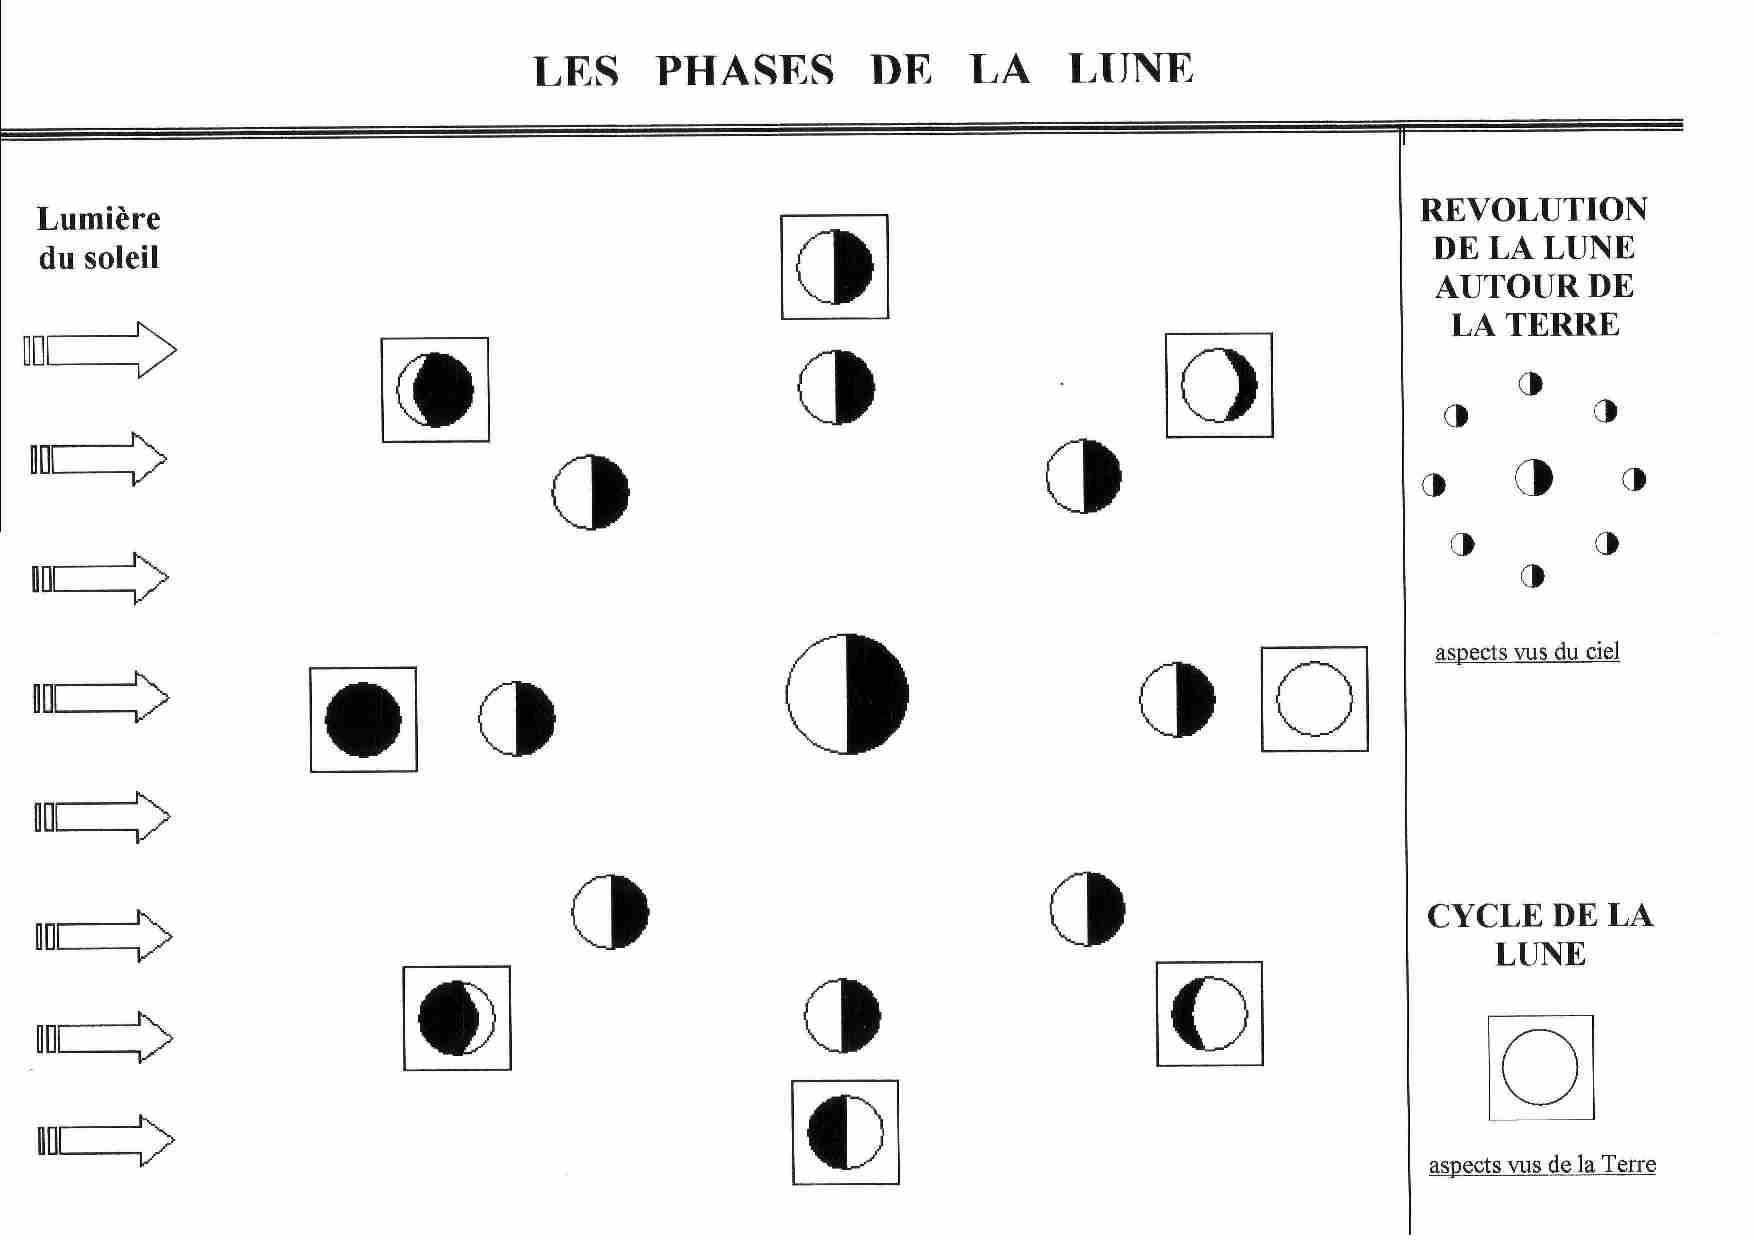 phase de la lune explication essay